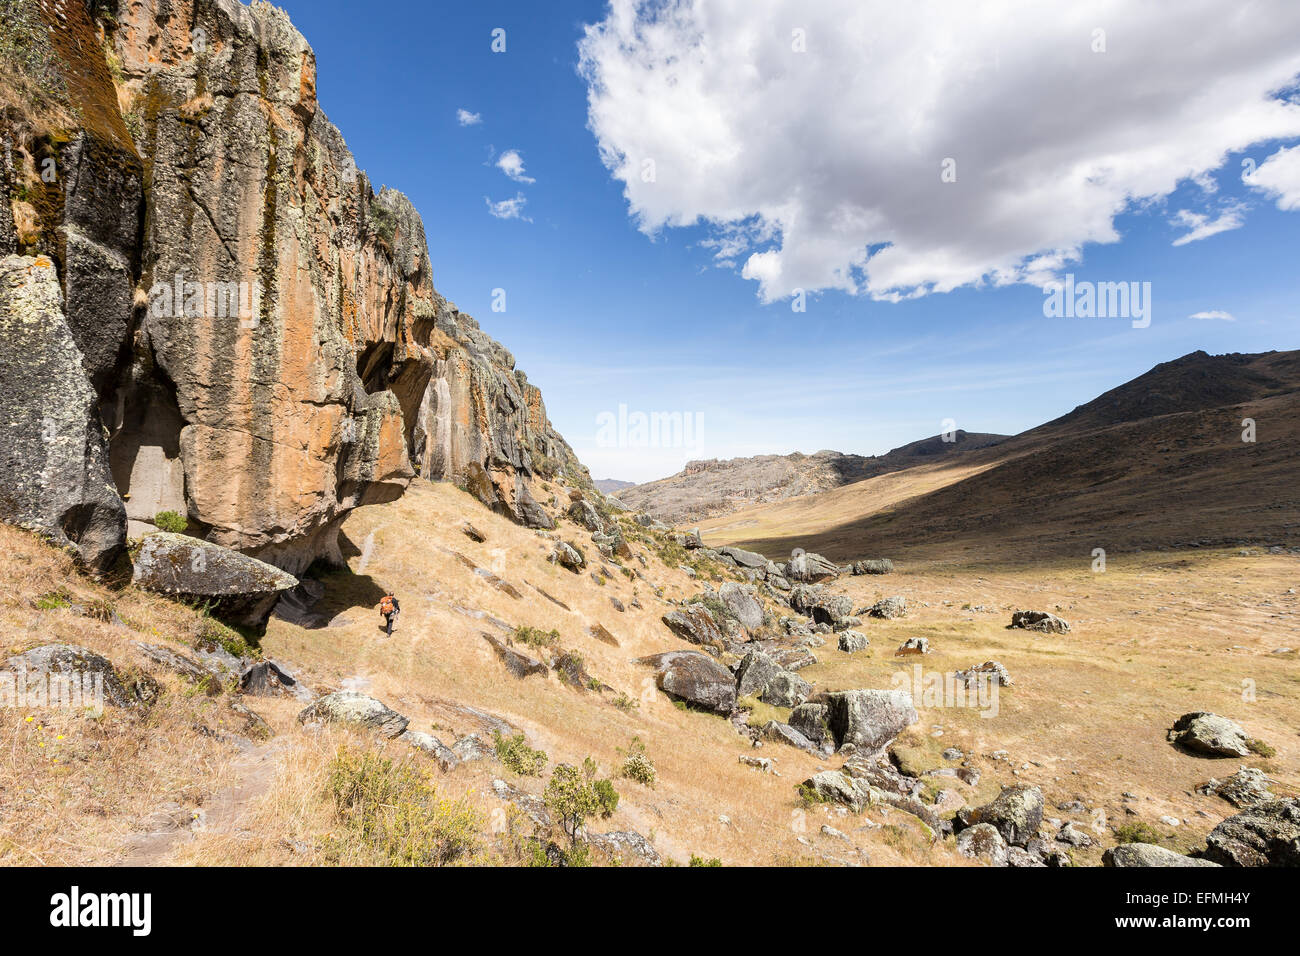 Rock climbing place at Hatun Machay, Cordillera Negra, Andes, Peru, South America Stock Photo